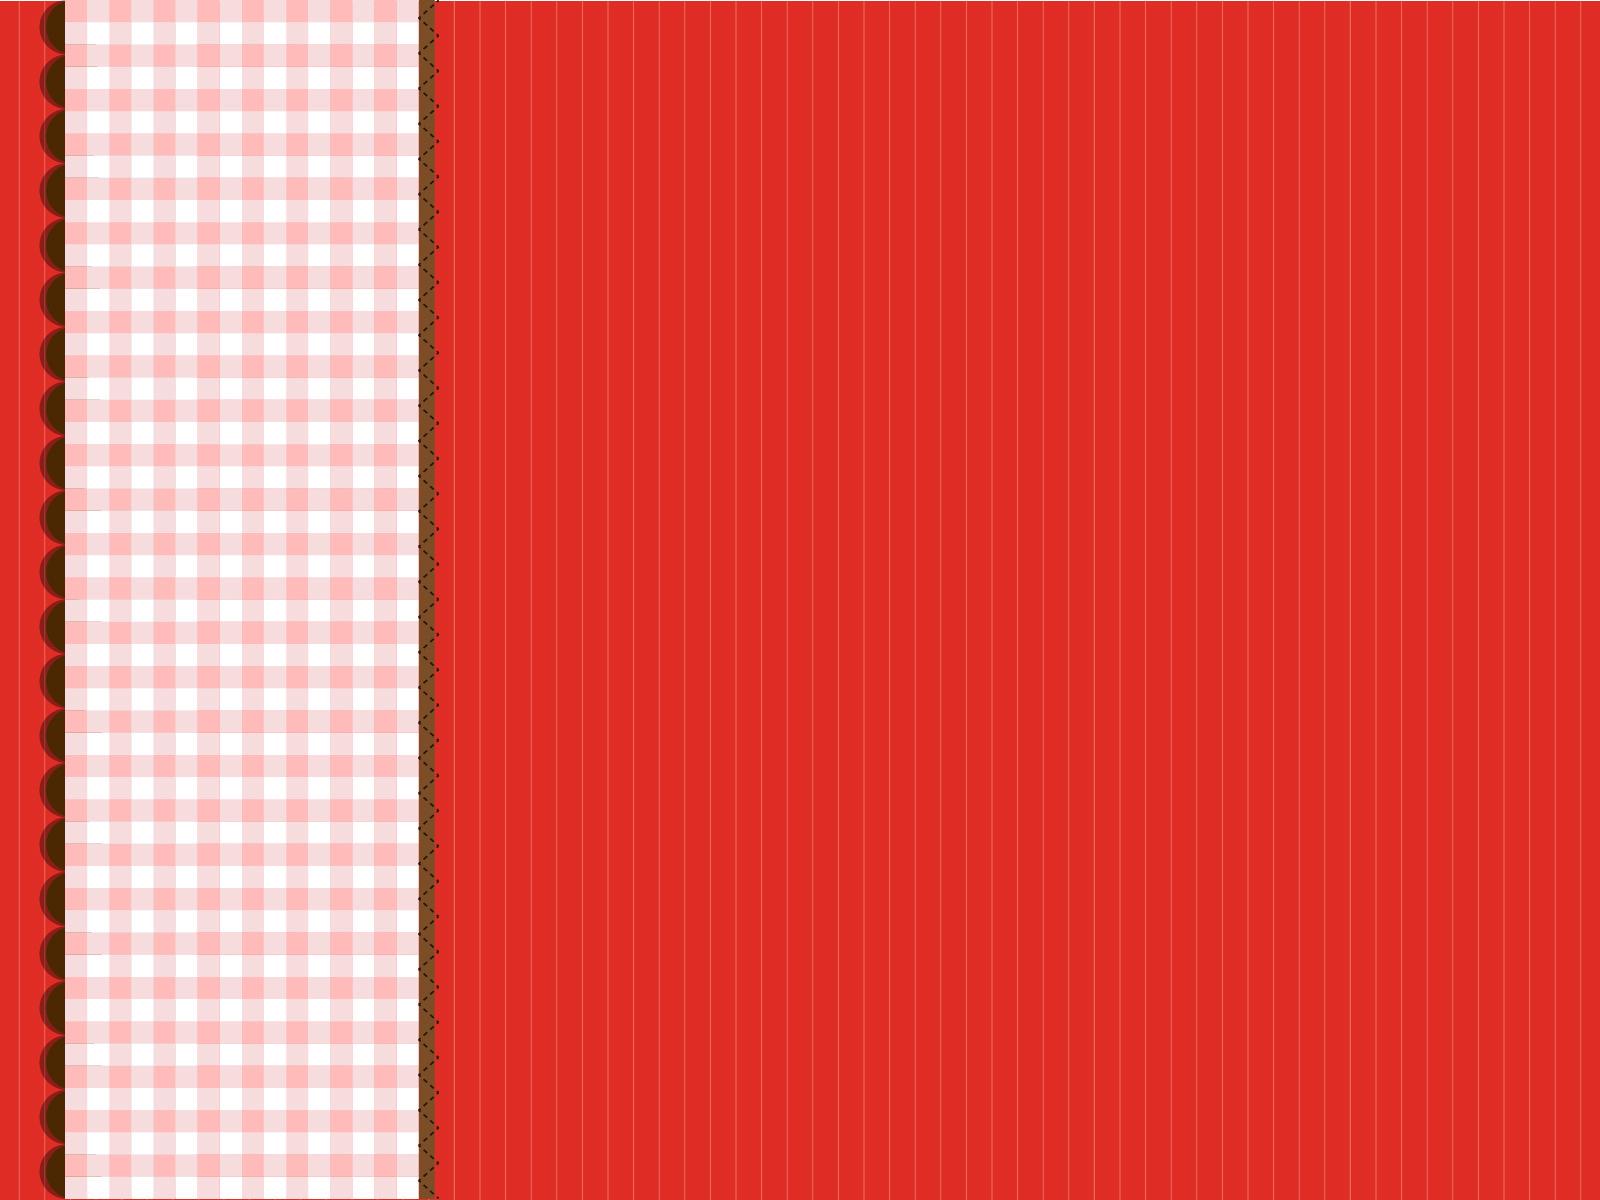 Brick Colour Bacround PPT Backgrounds